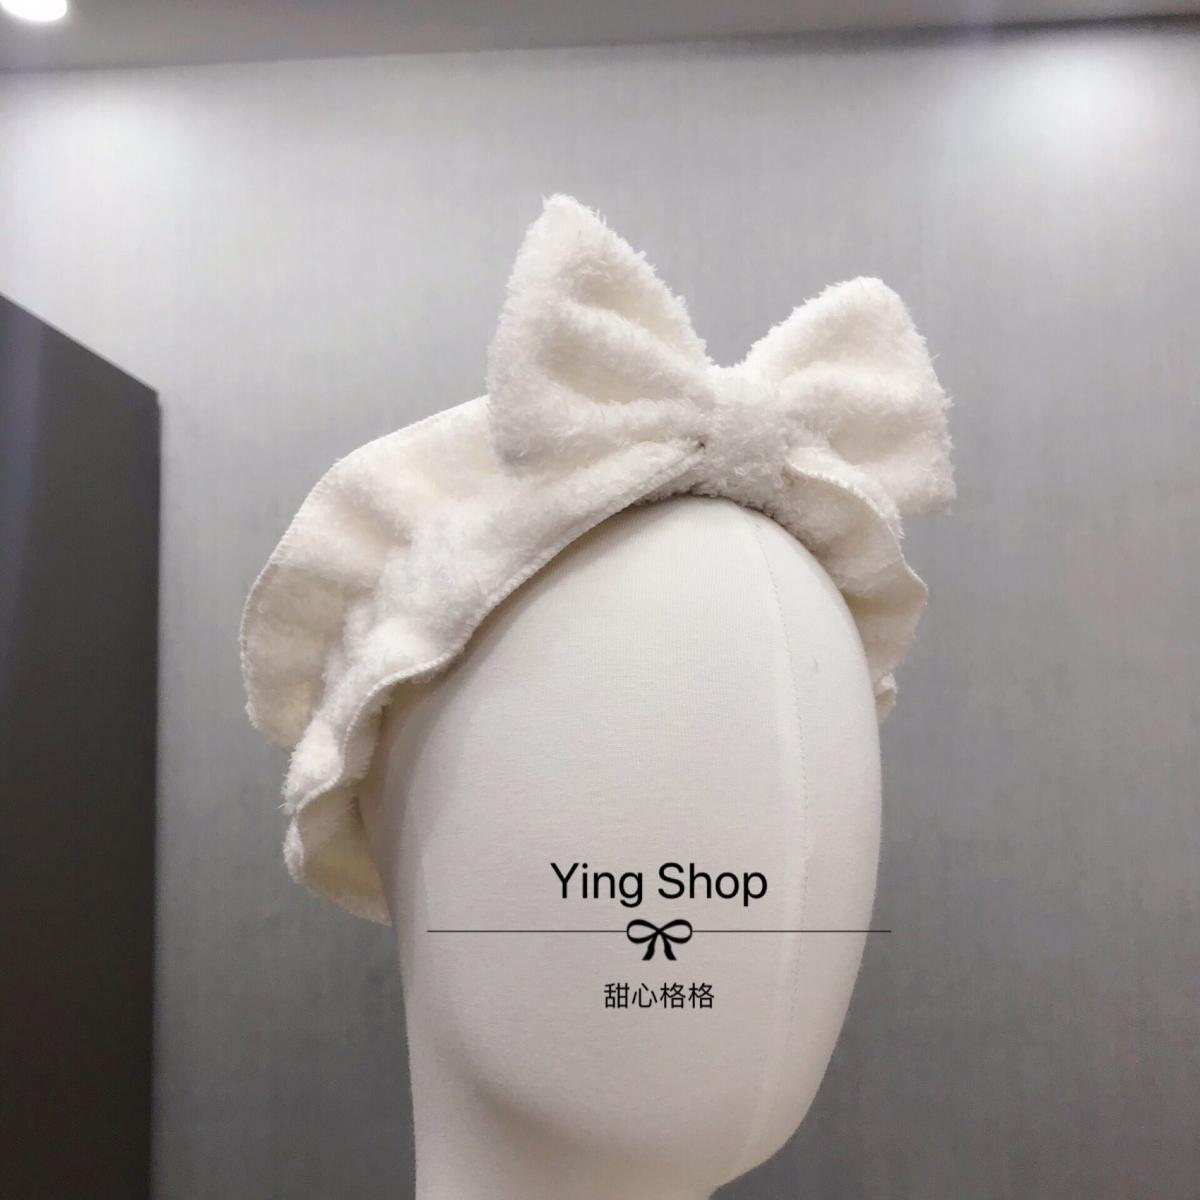 Ying,日系 羽毛绒蝴蝶结发带甜美软妹荷叶边宽边弹力洗脸束发带